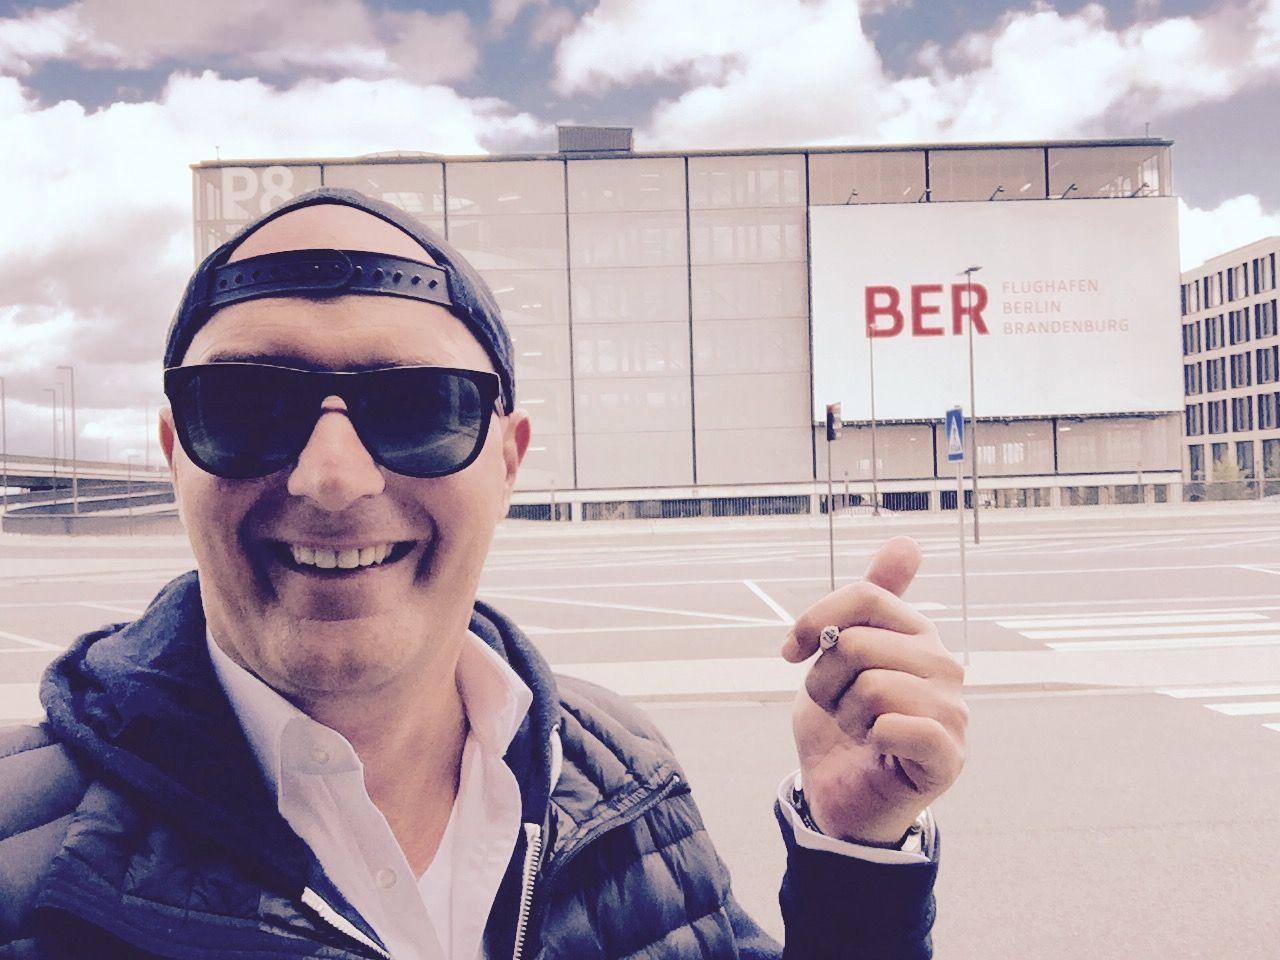 Kurzbesuch am Flughafen BER